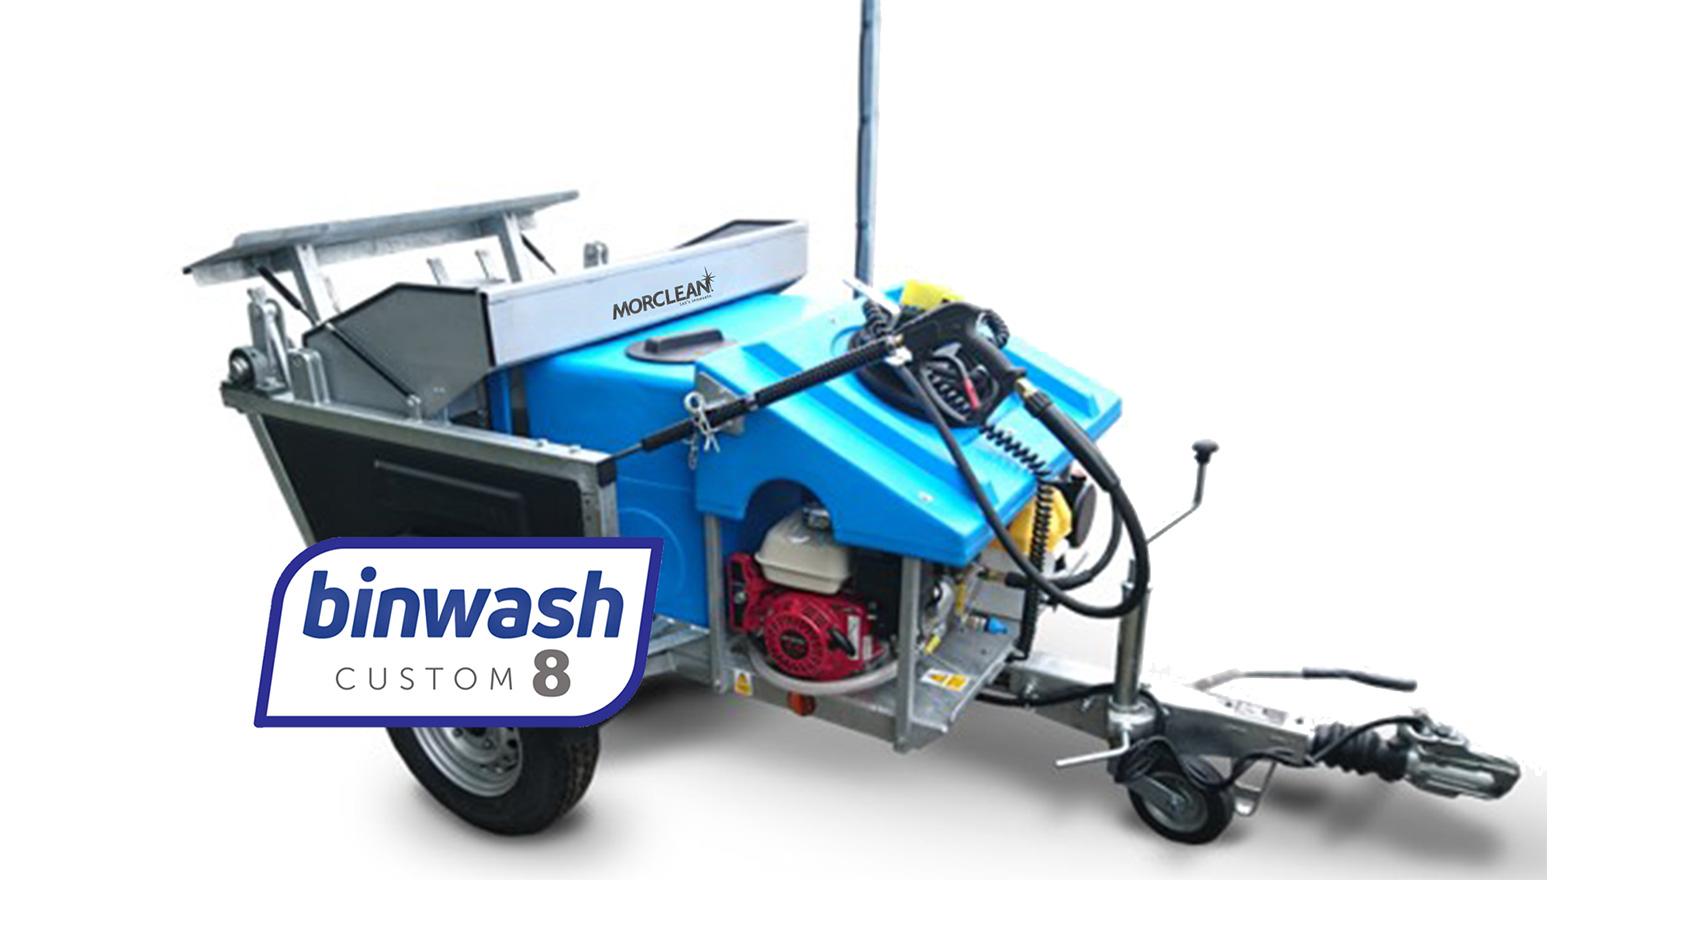 custom 8 petrol bin wash